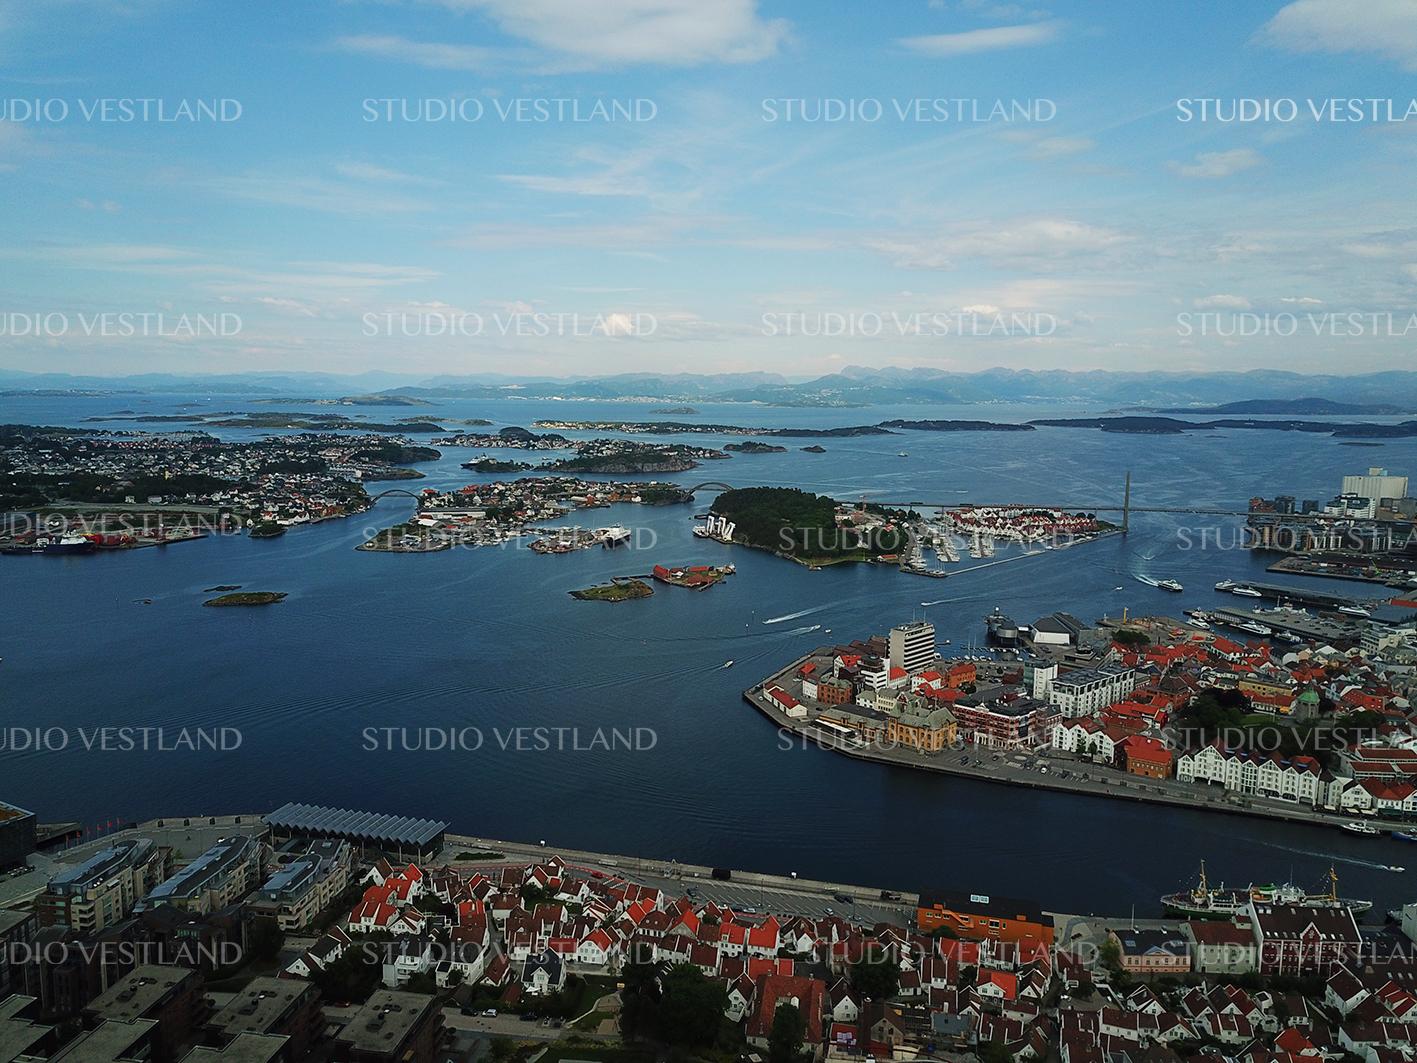 Studio Vestland - Stavanger 07